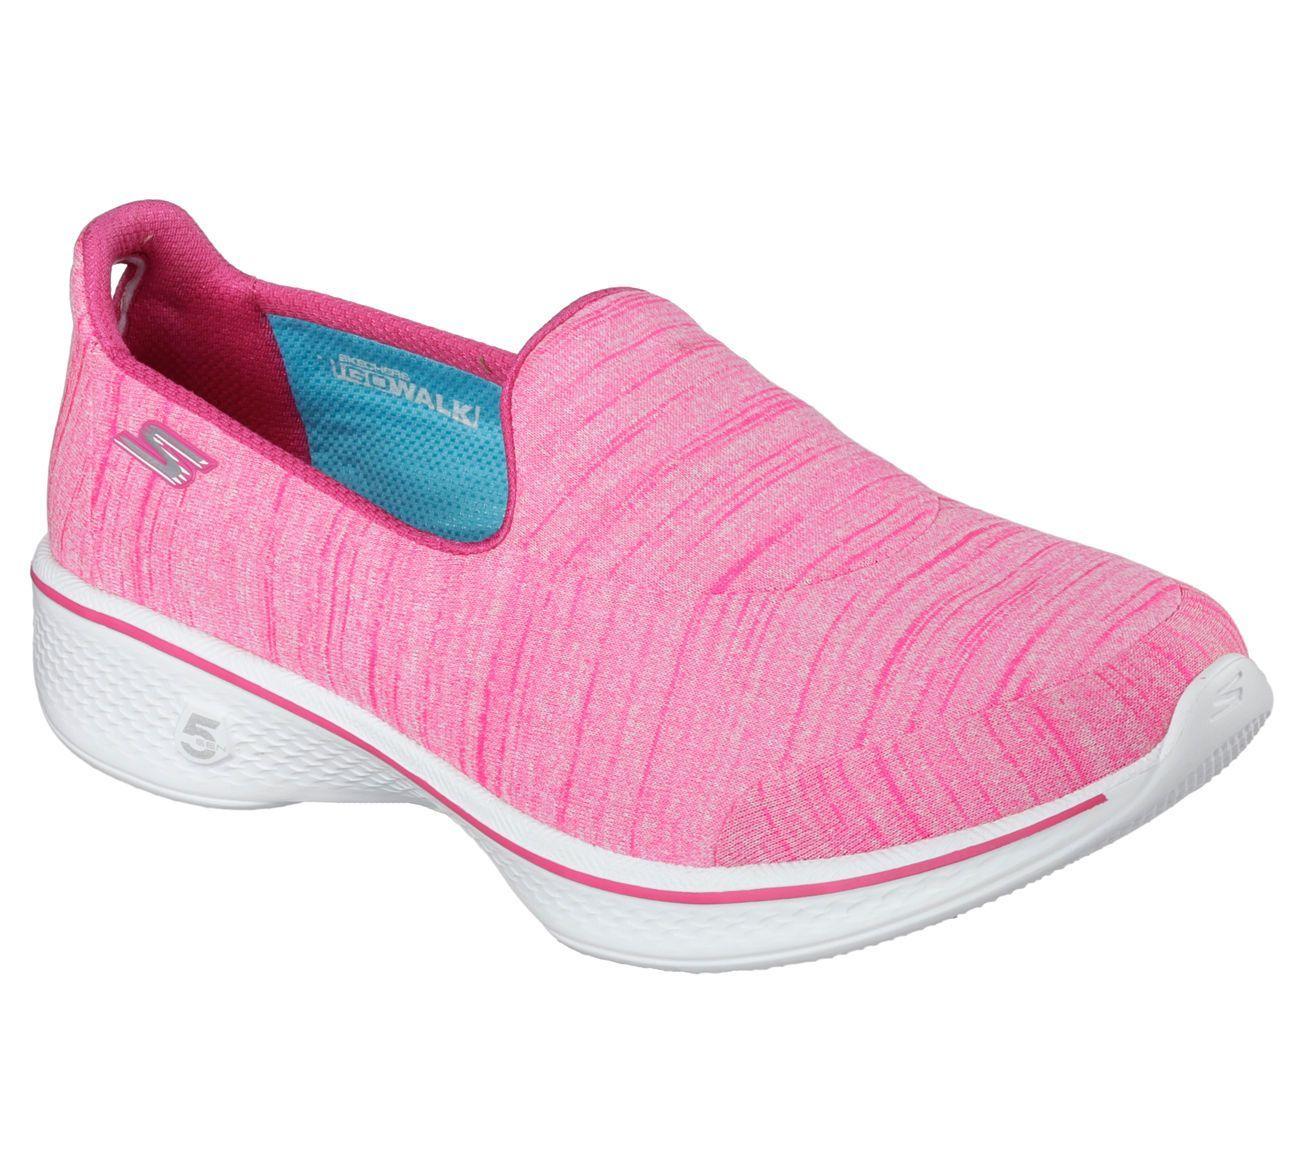 14149 Hot Pink Skechers Shoes Go Walk 4 Women Soft Fabric Slip On